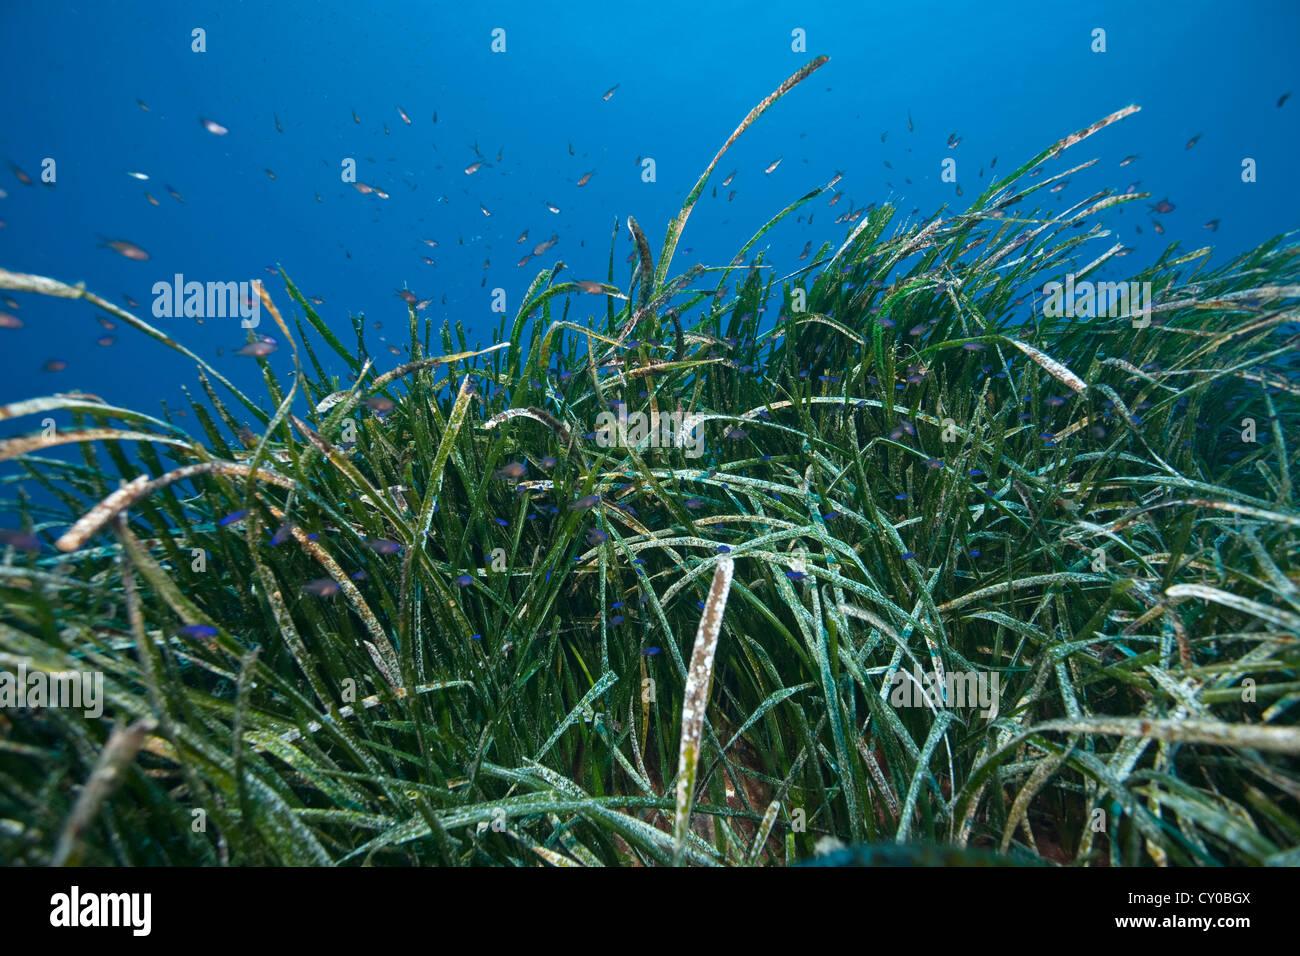 Seagrass (Posidonia), Sa Dragonera Nature Reserve, San Telmo, Sant Elm, Majorca, Mallorca, Balearic Islands, Spain, - Stock Image